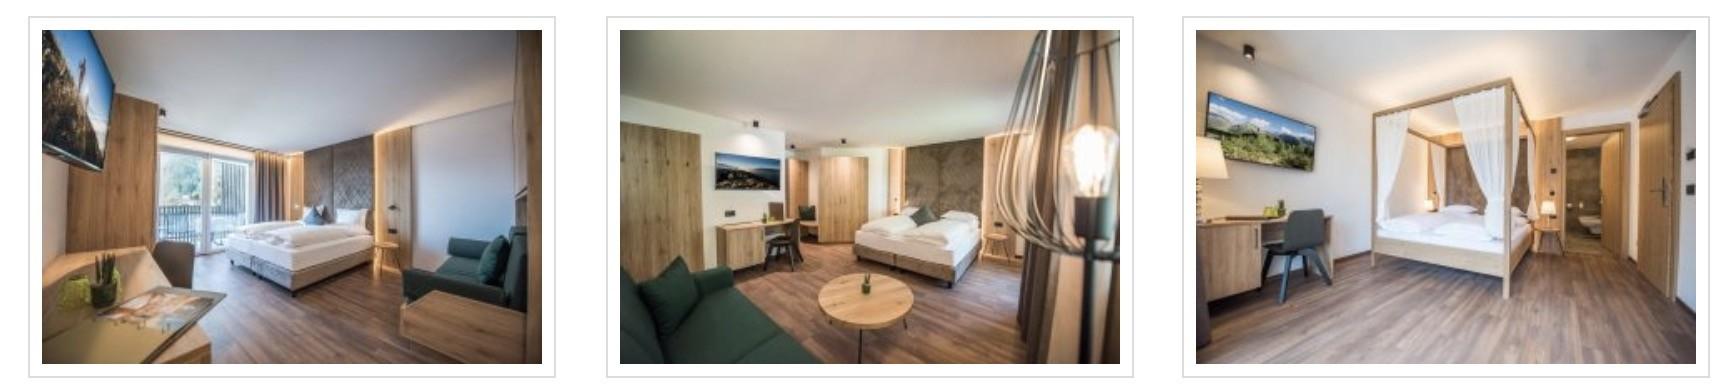 Hotel Vitaurina Royal Sand Partnerprogramm Galerie Zimmer